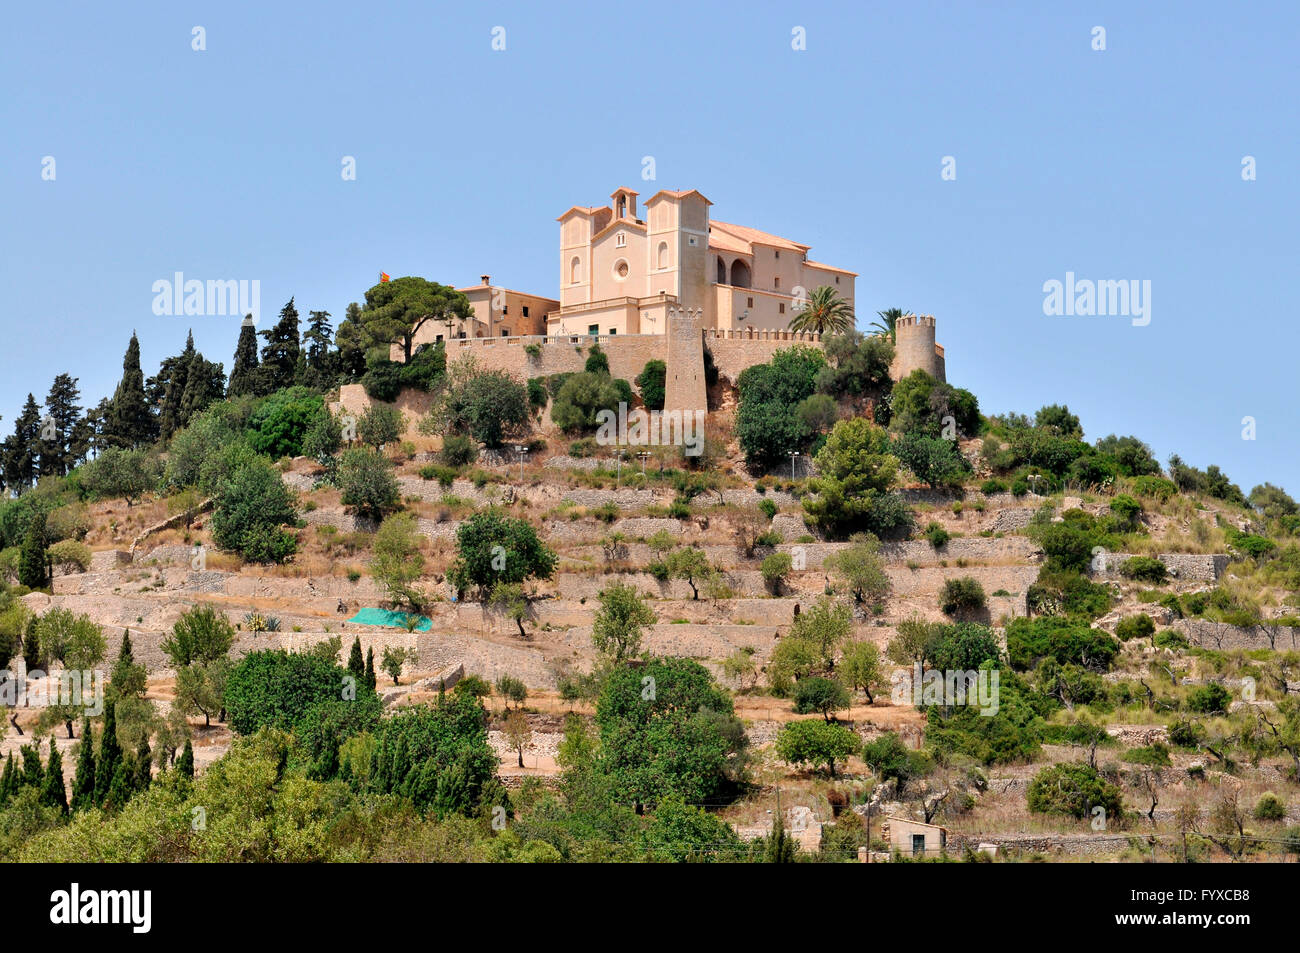 Fortress church San Salvador, Arta, Mallorca, Spain - Stock Image